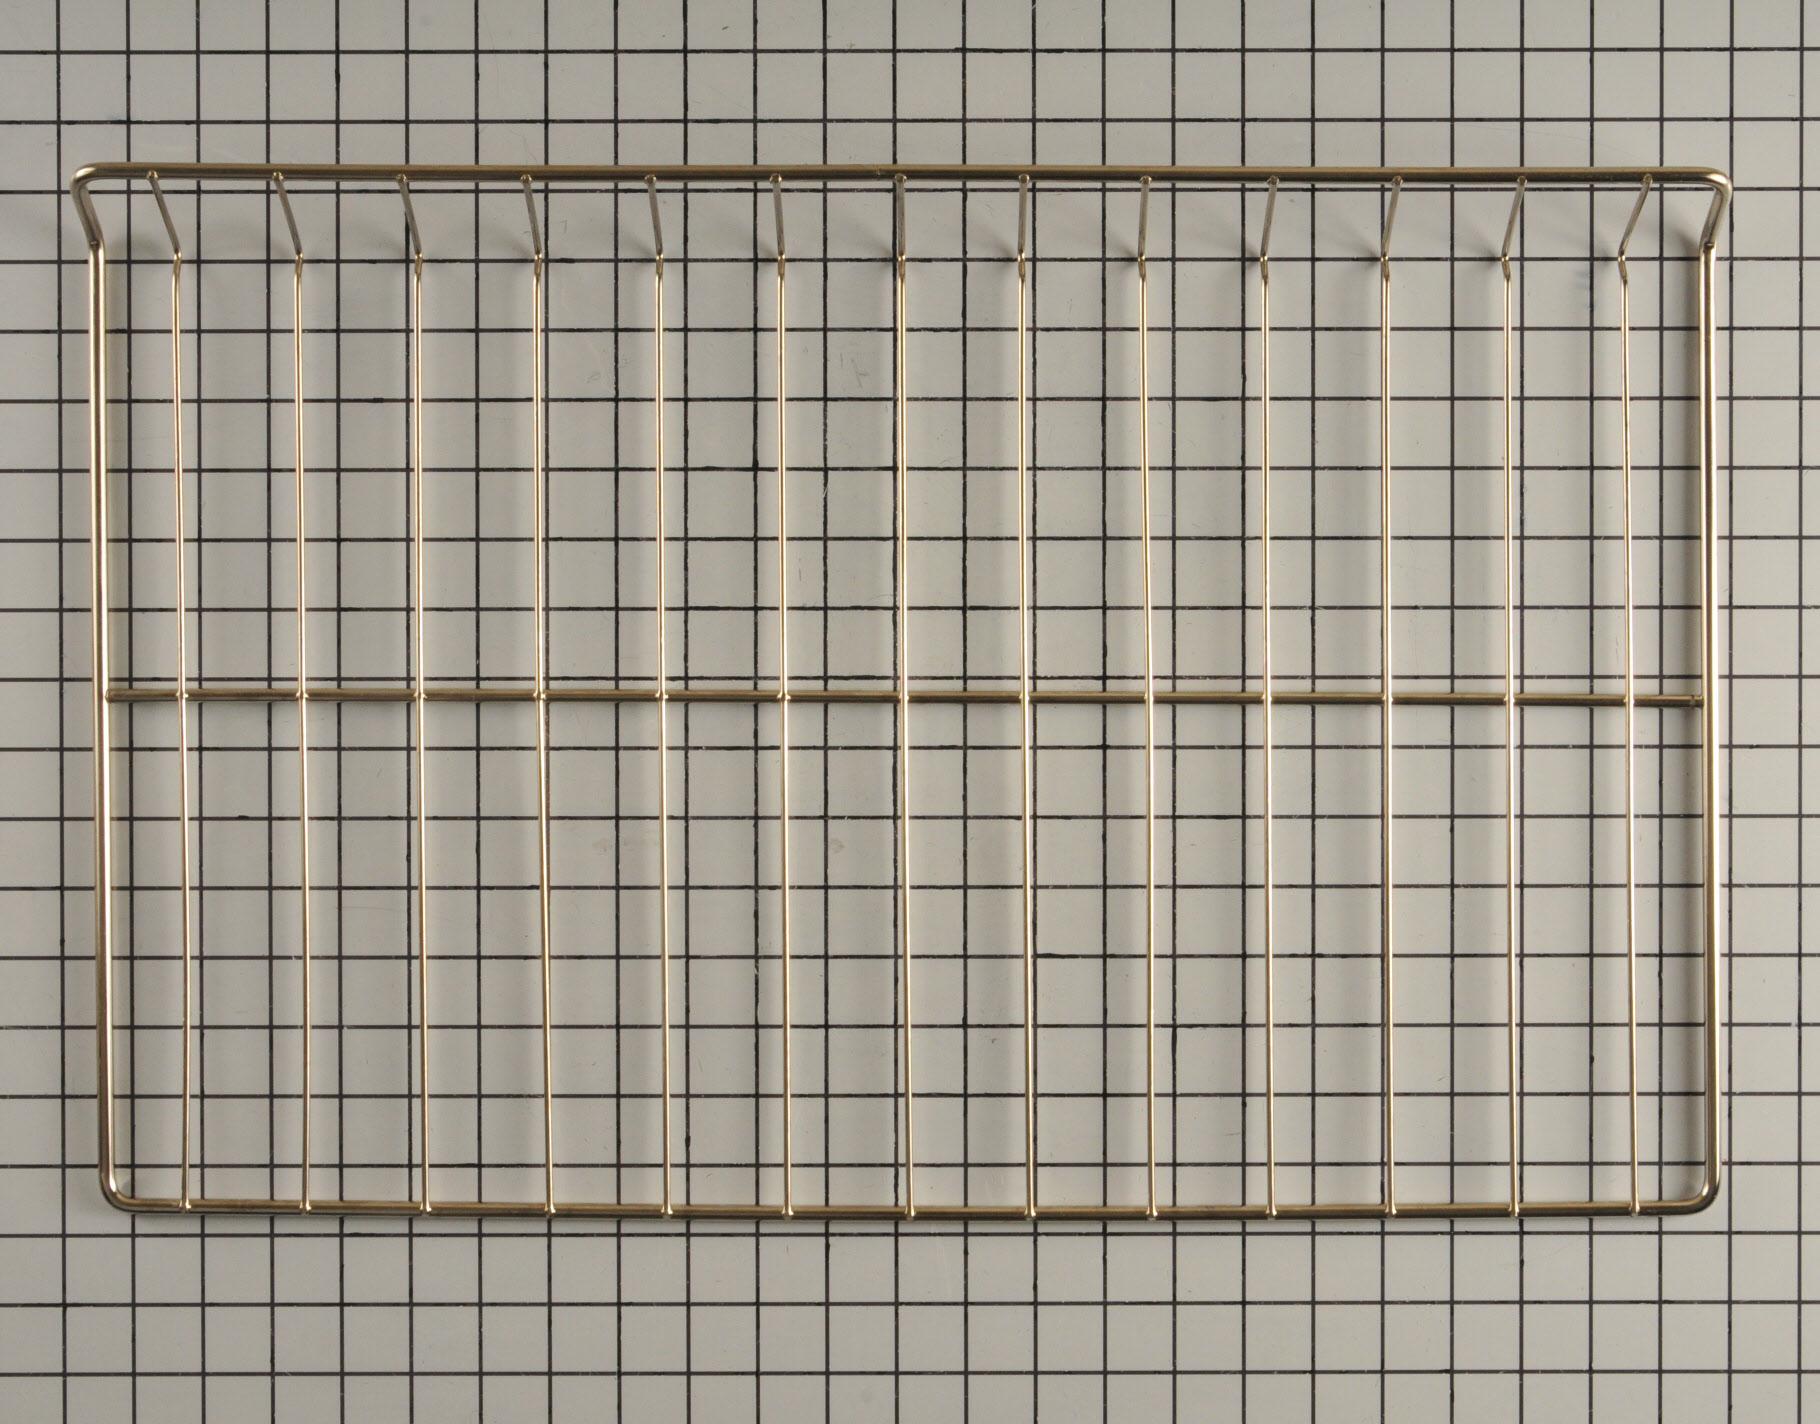 KitchenAid Range/Stove/Oven Part # WPW10179152 - Rack